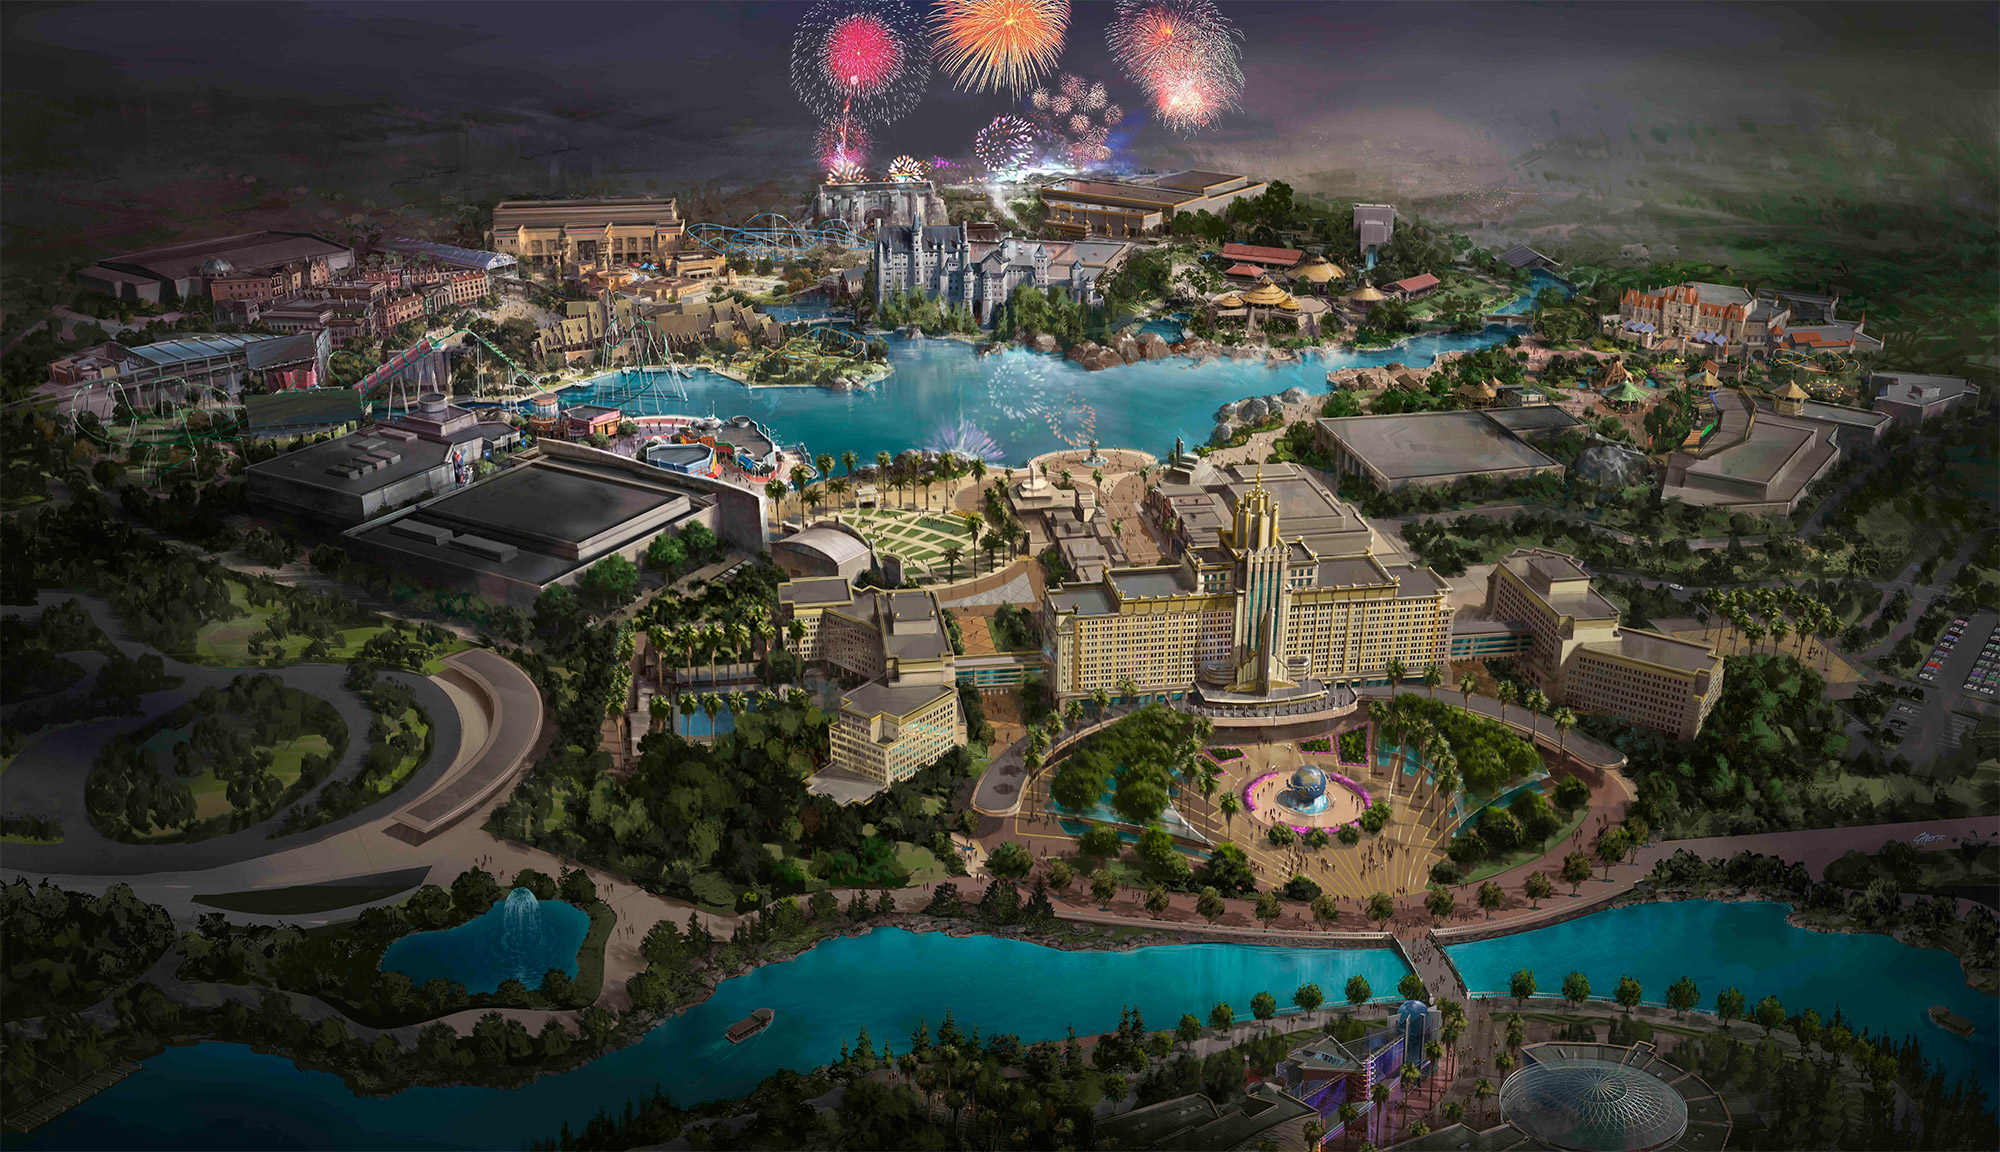 Universal Studios, a Bejing apre il nuovo parco a tema